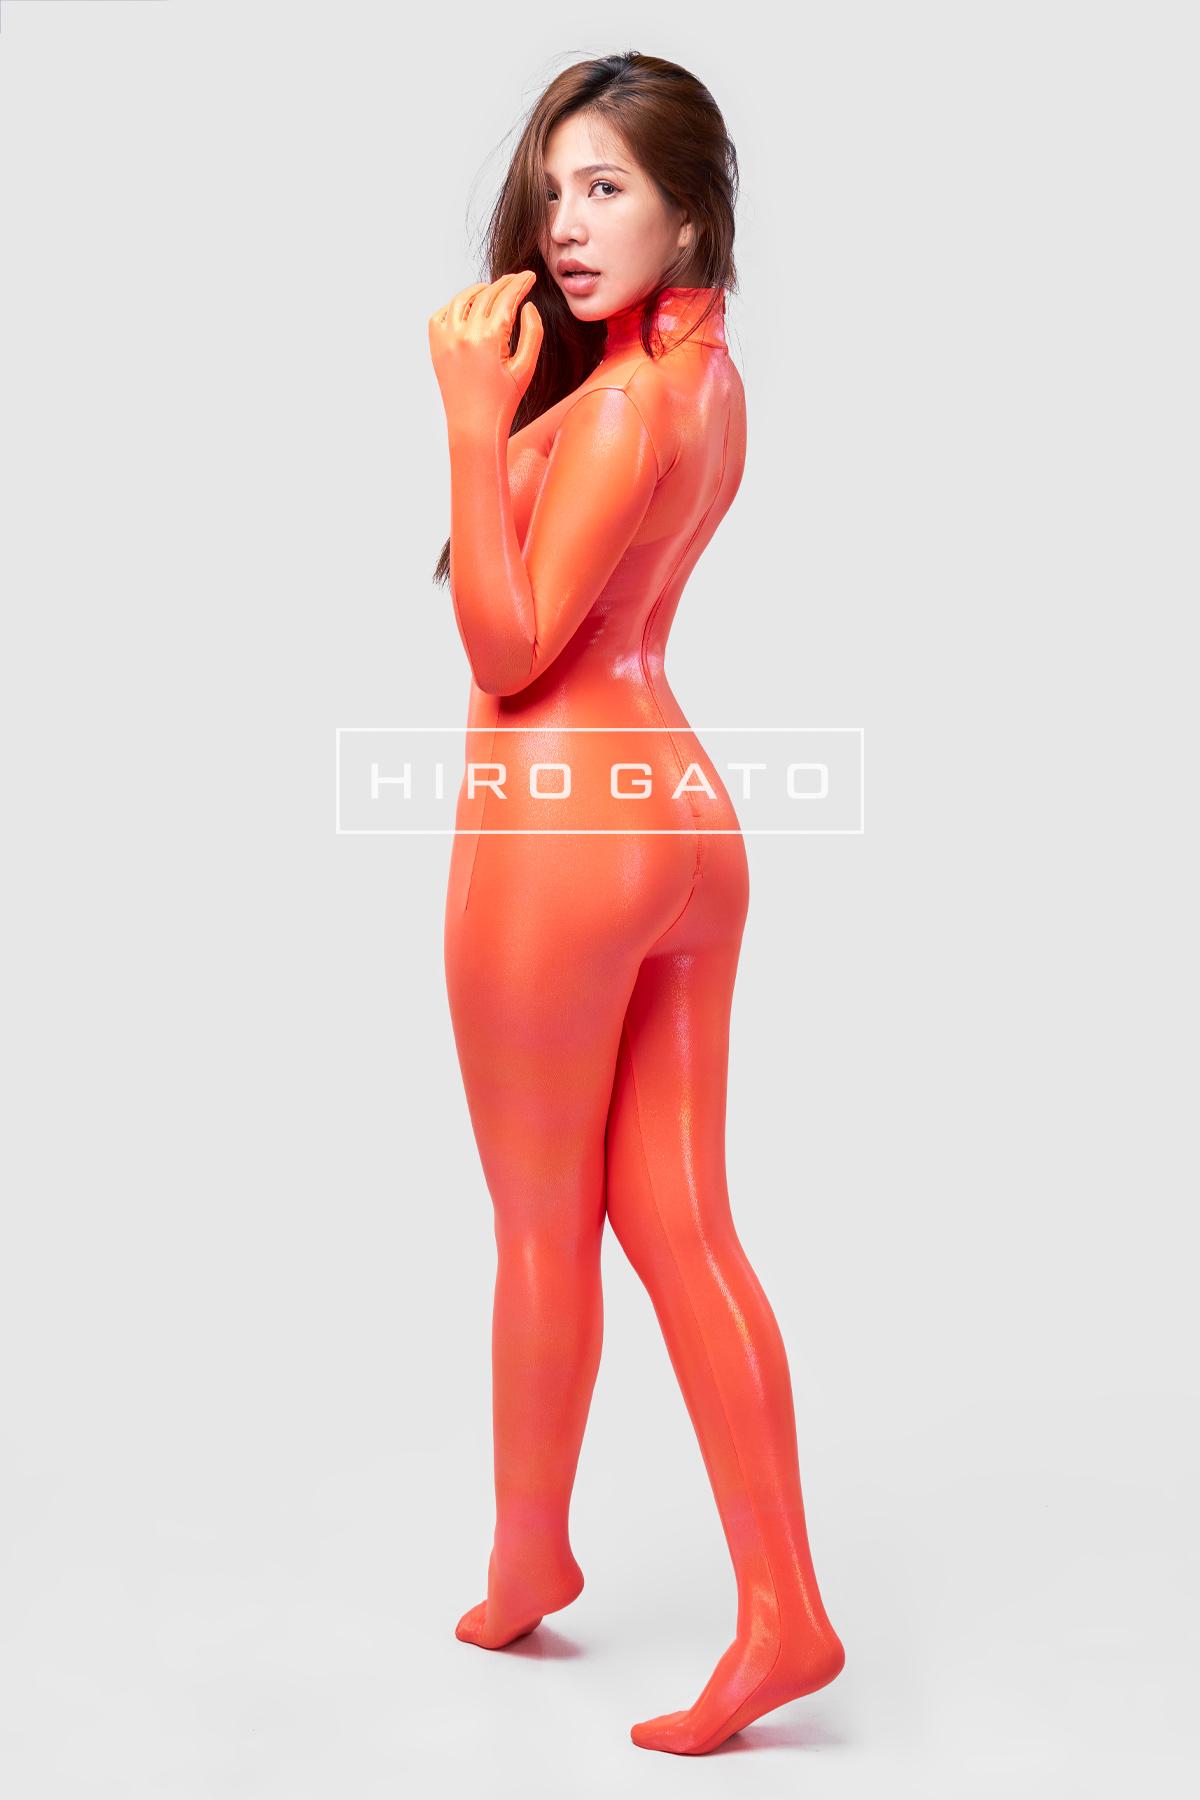 HIRO GATO Mystique Metallic Spandex Unitard Orange Burning Suit Rave Party Lycra Catsuit Bodysuit